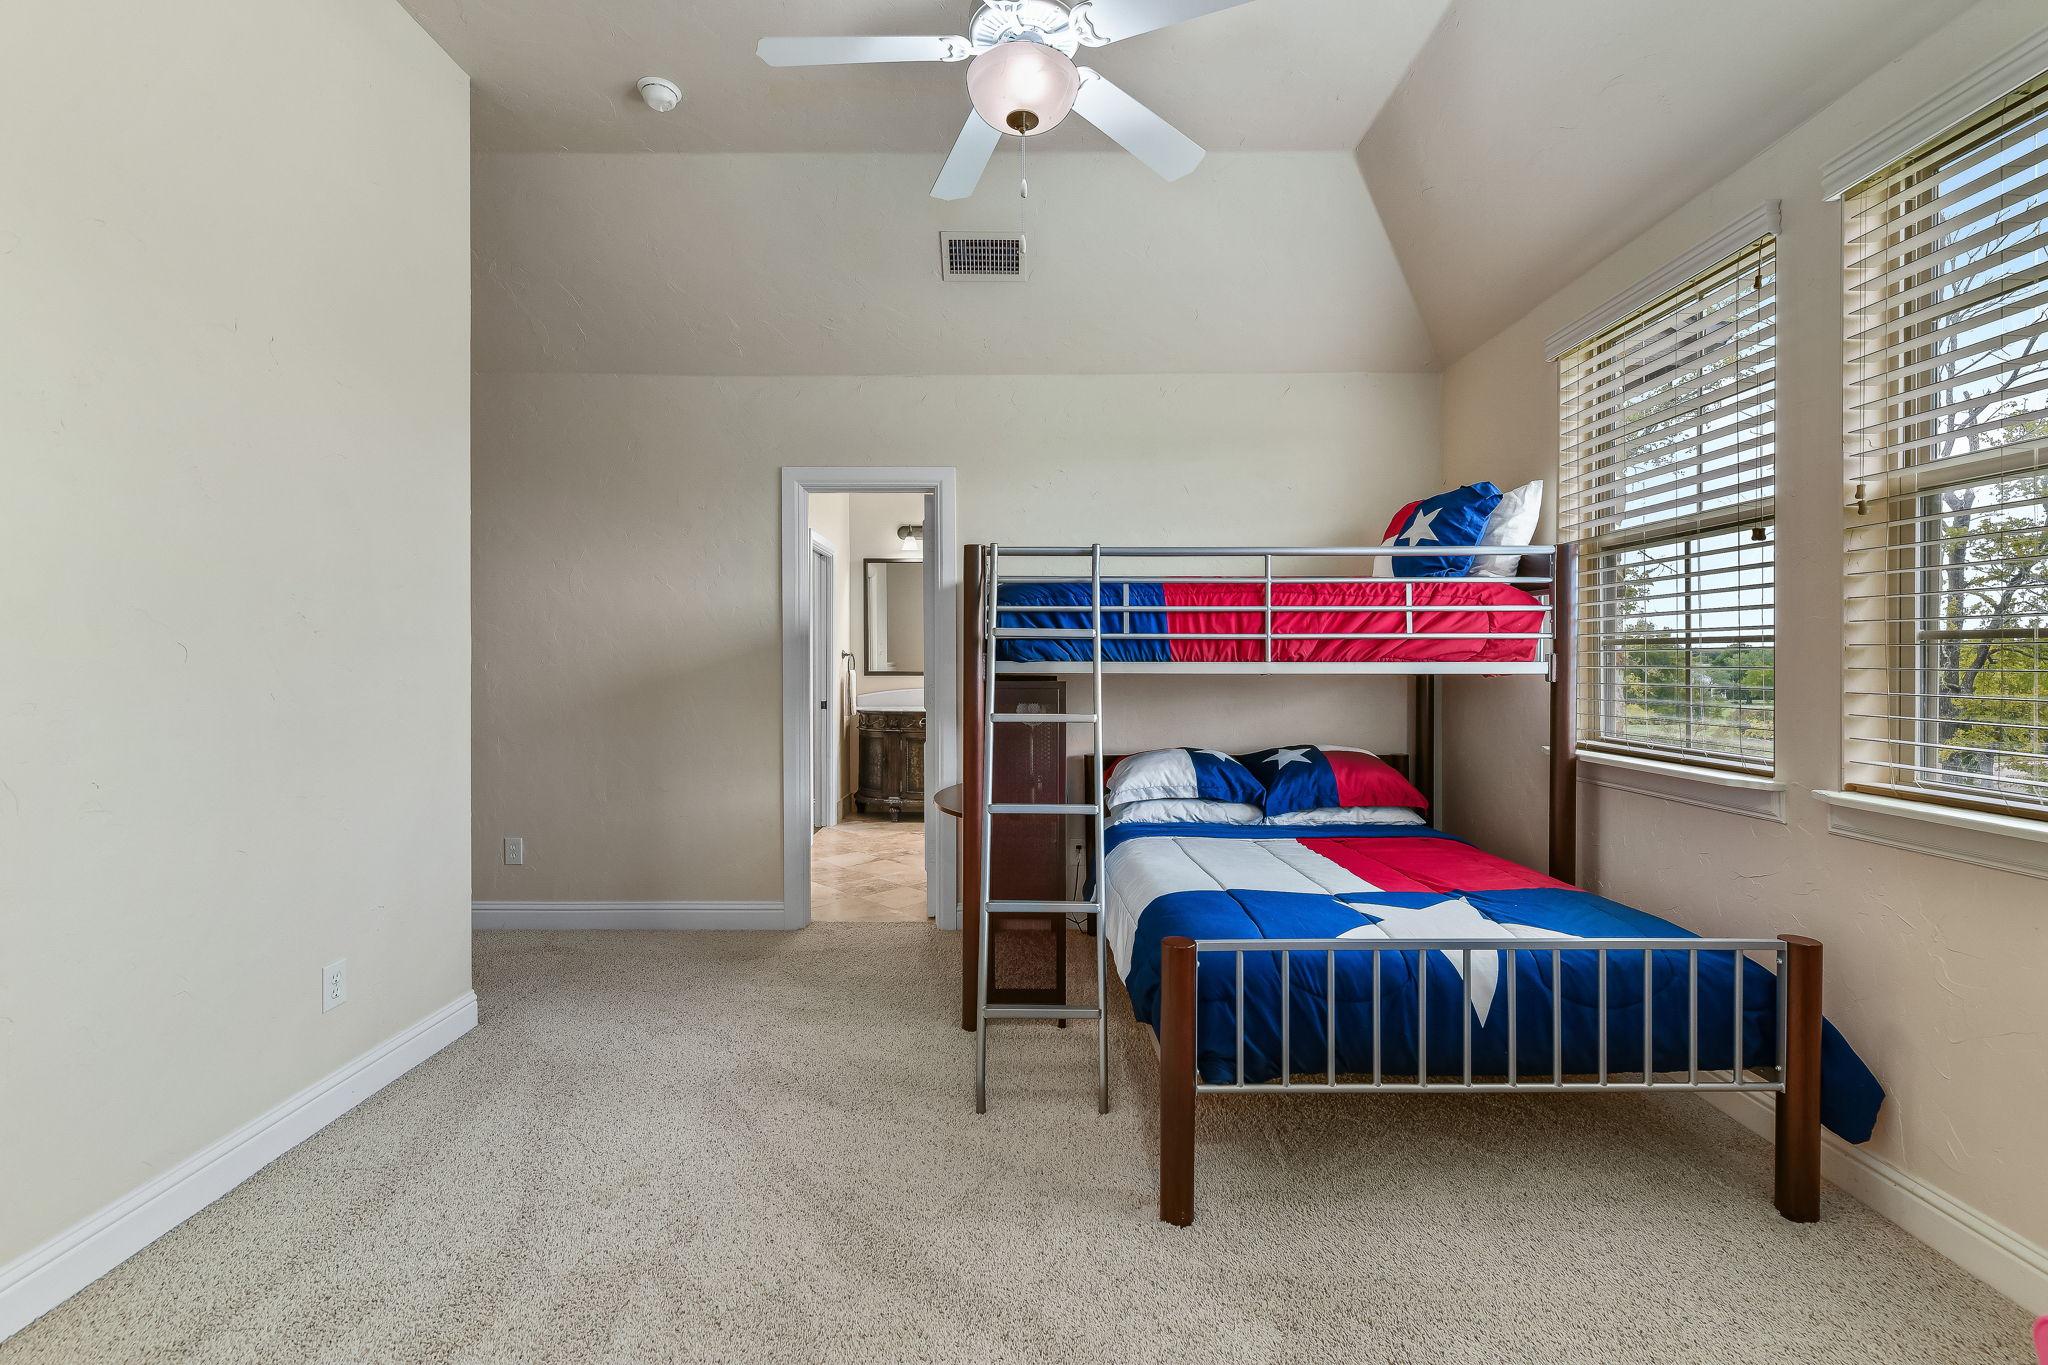 035-Bedroom 5-FULL